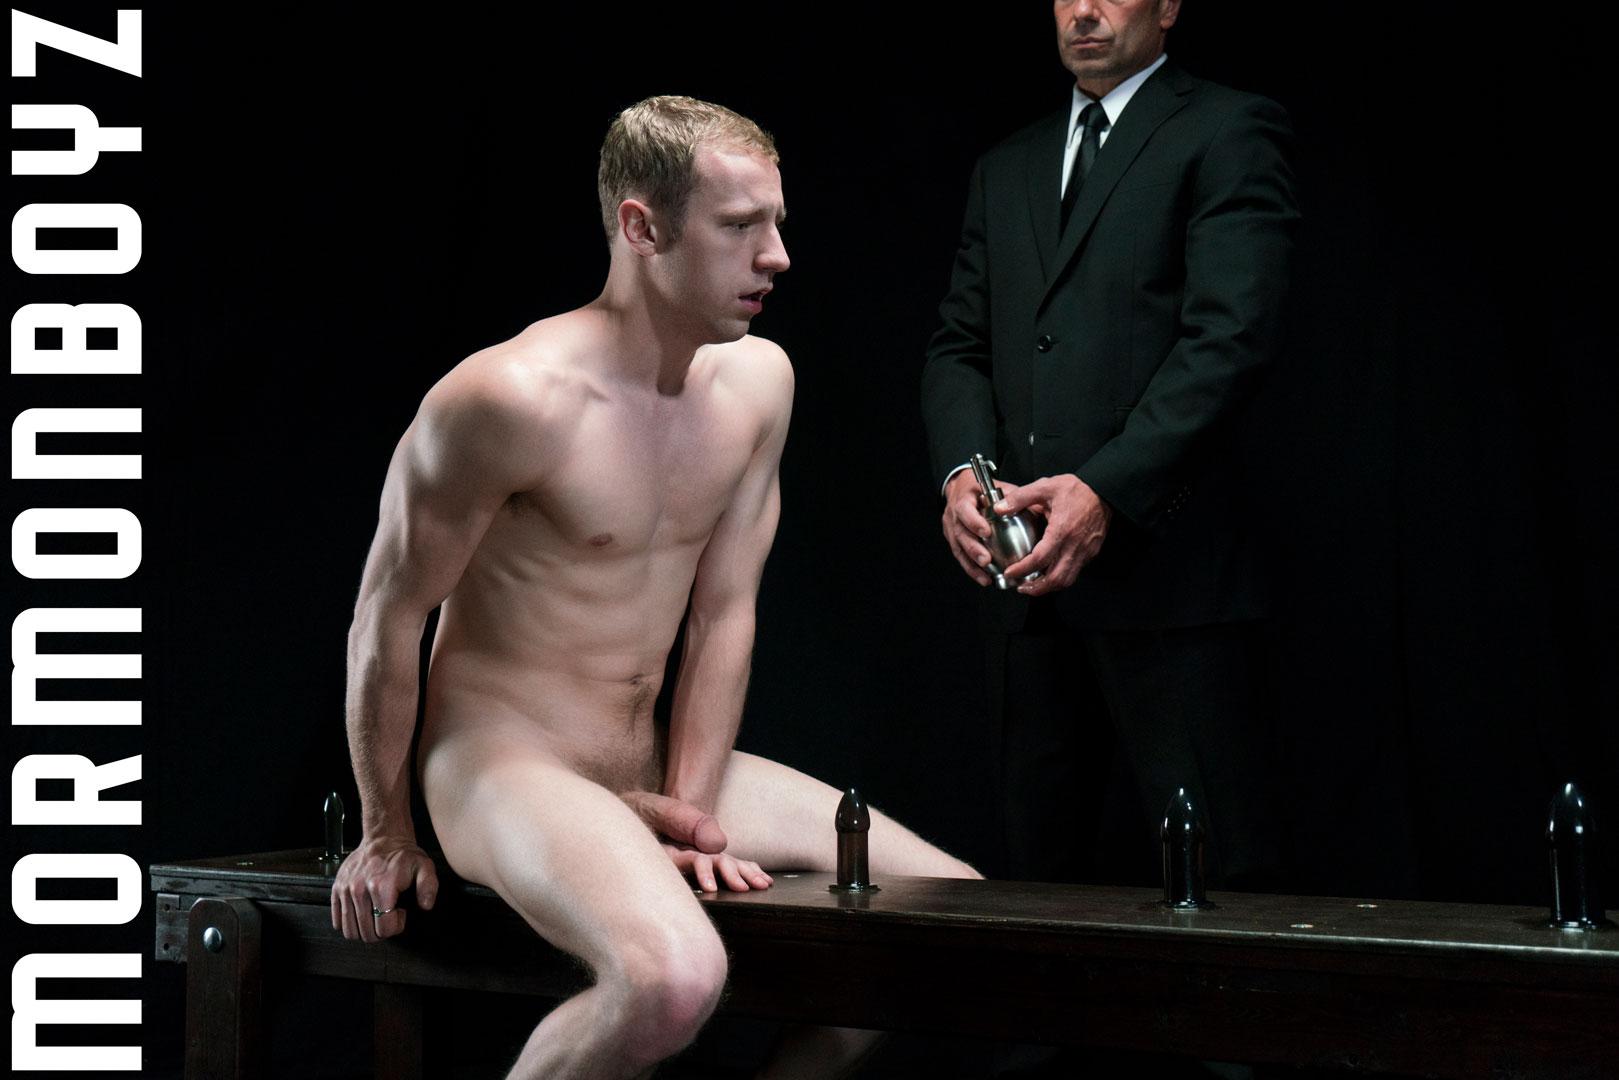 Gay spanking holland